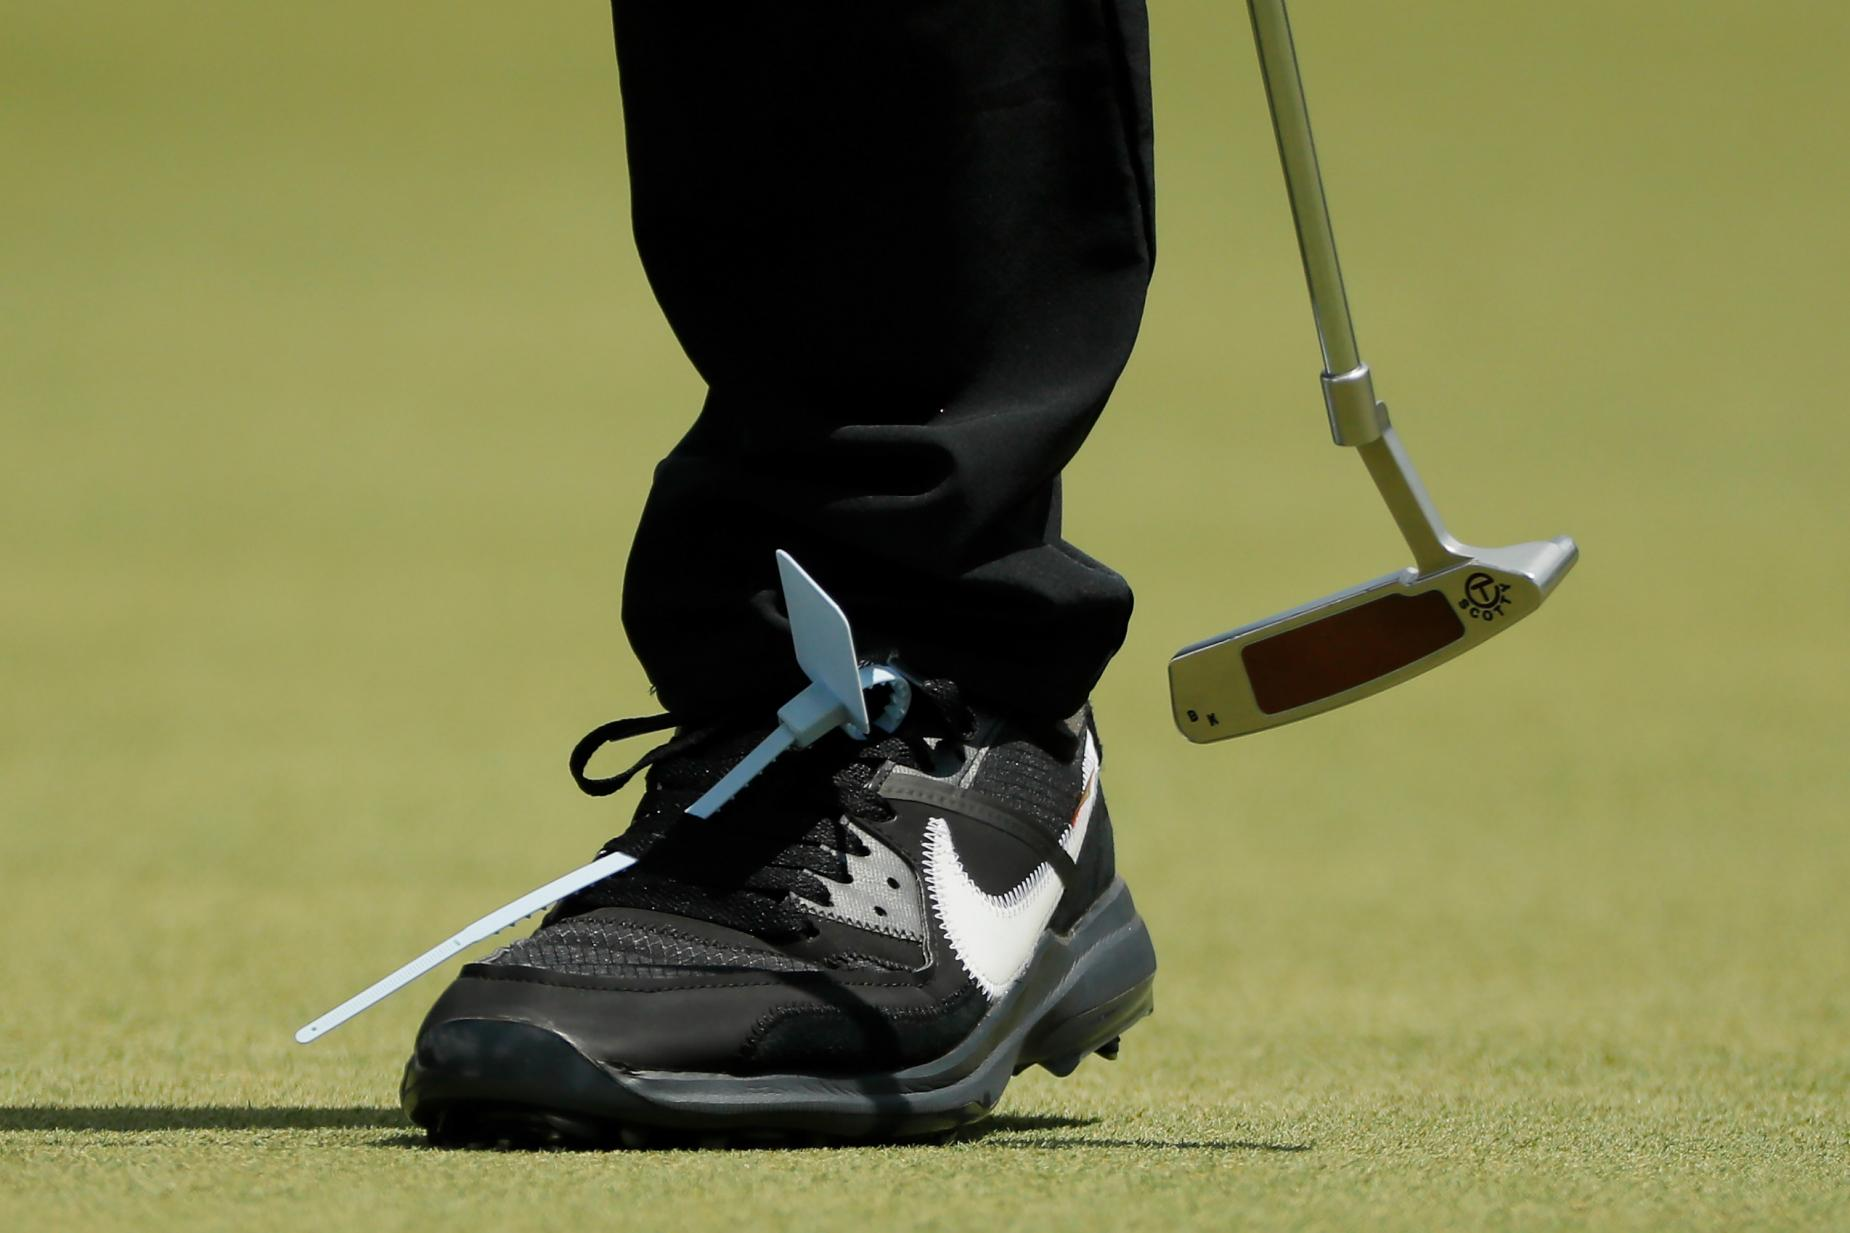 brooks golf shoes